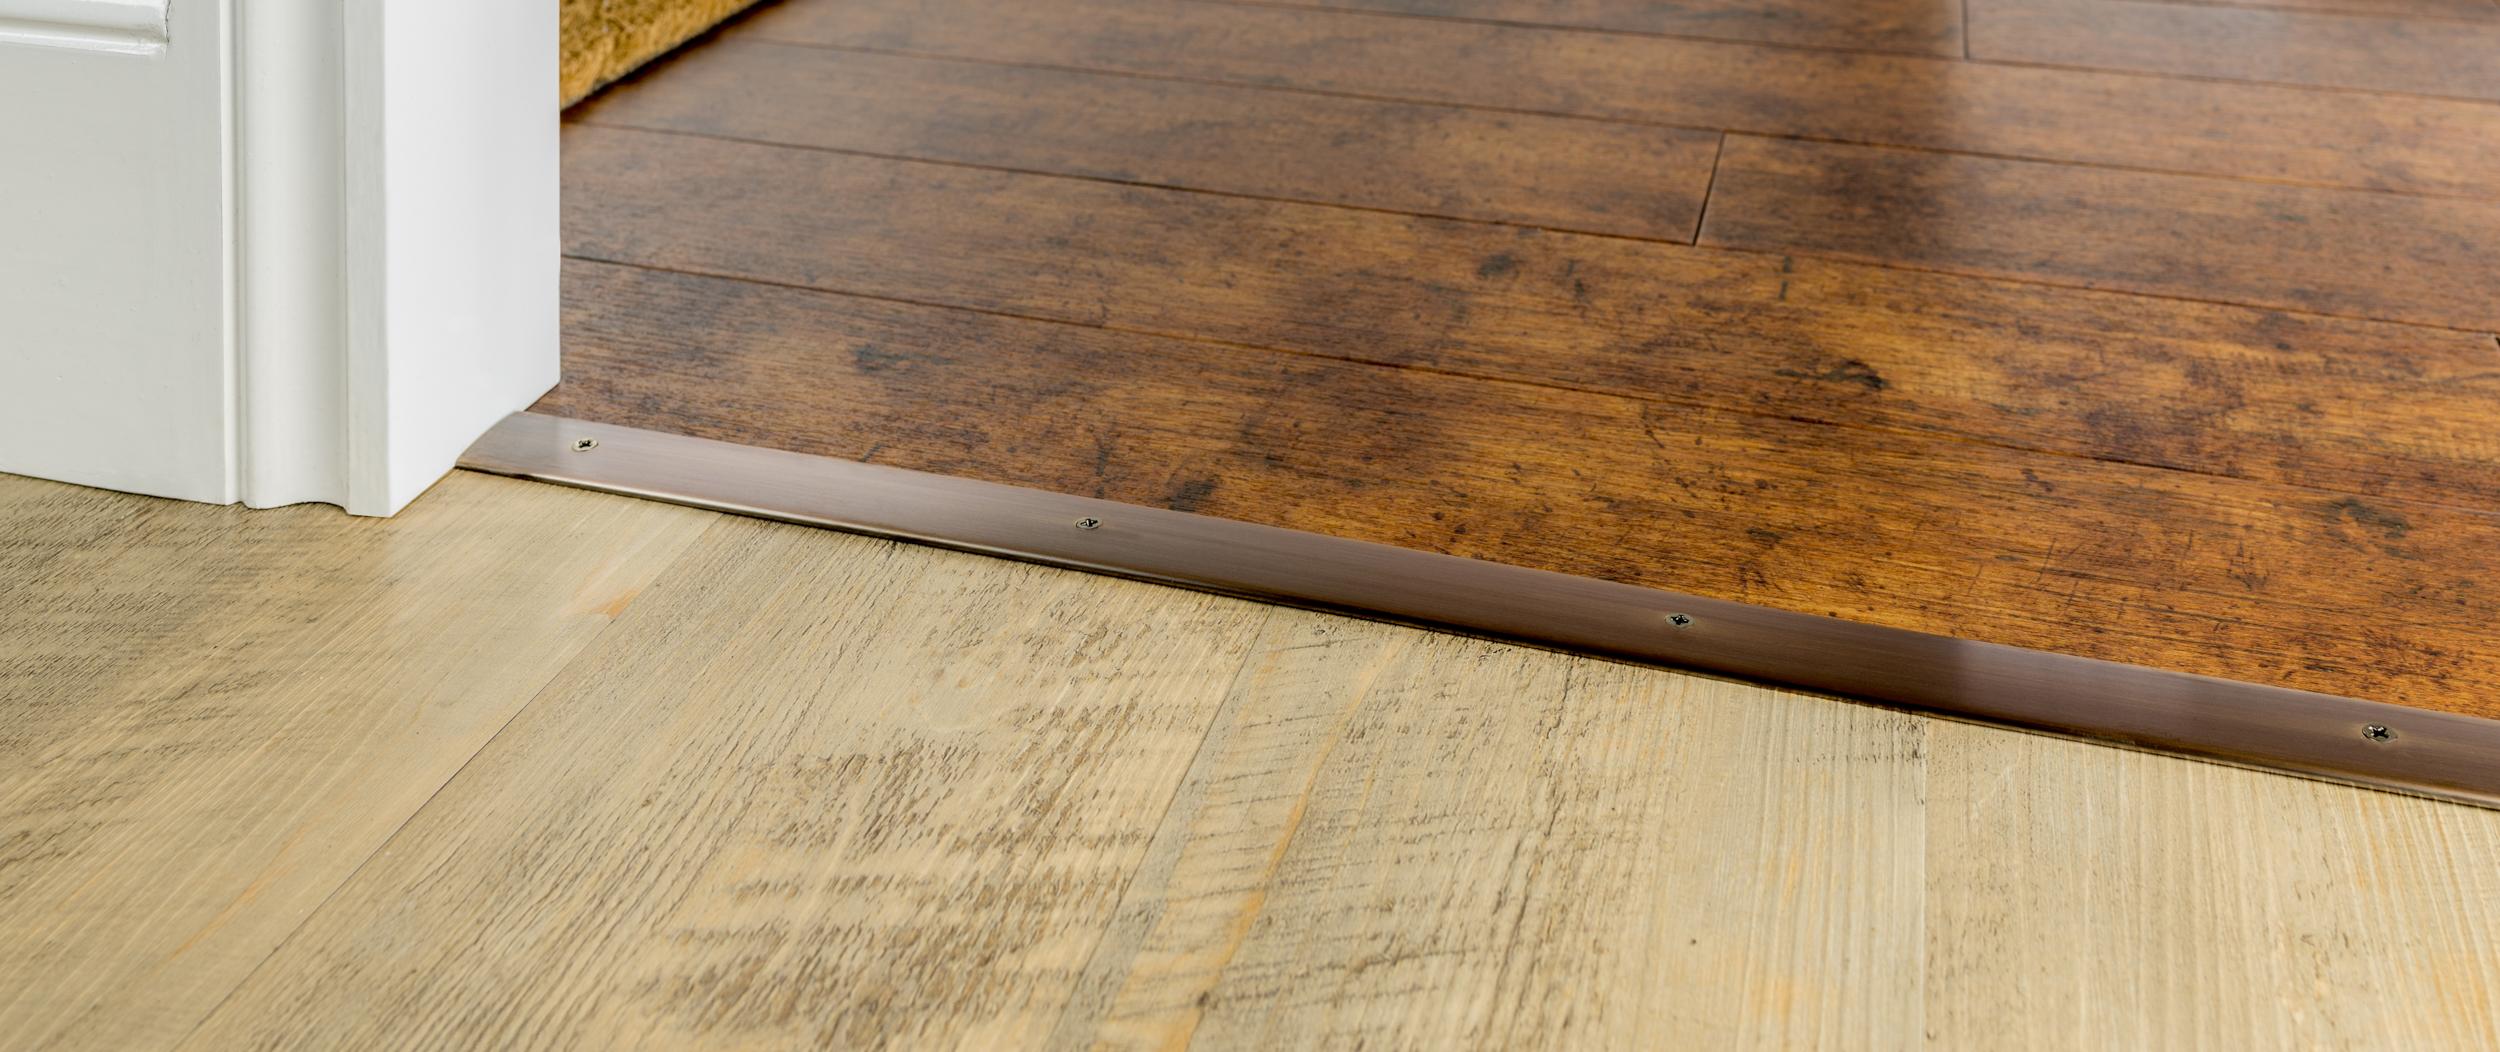 stairrods-bronze-cover30-hth.jpg